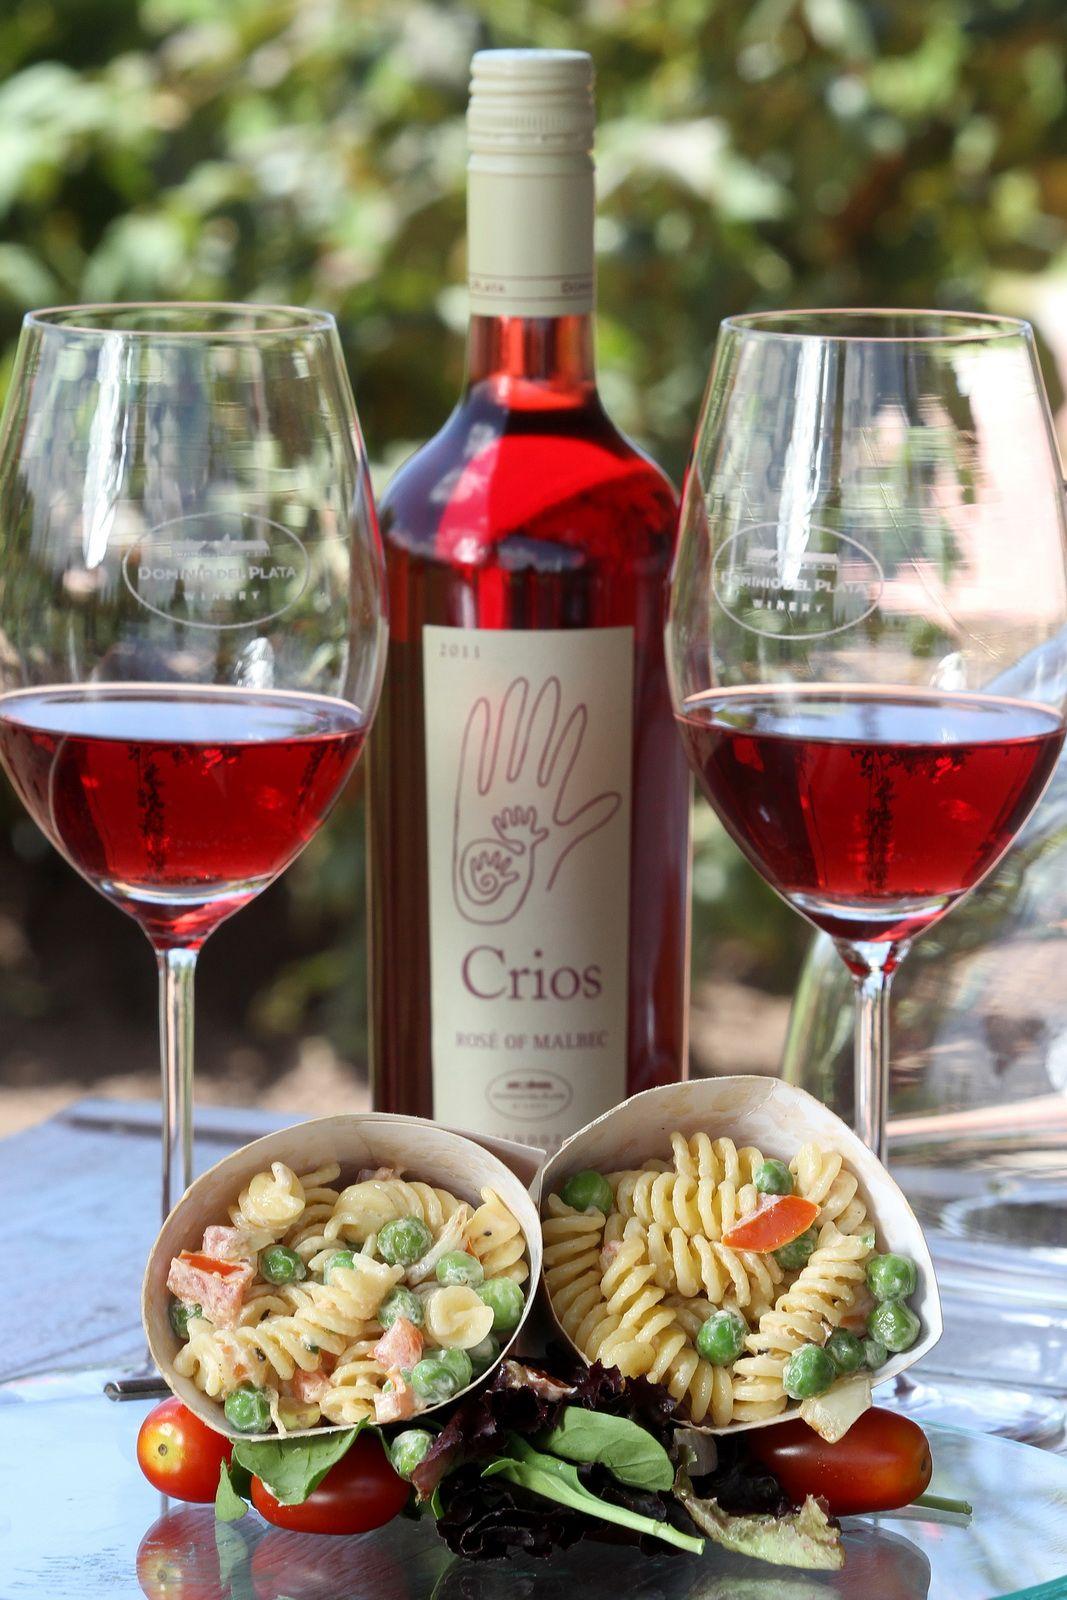 Screw Pasta Cone With Crios Rose Of Malbec Food Experiences Argentina Food Malbec